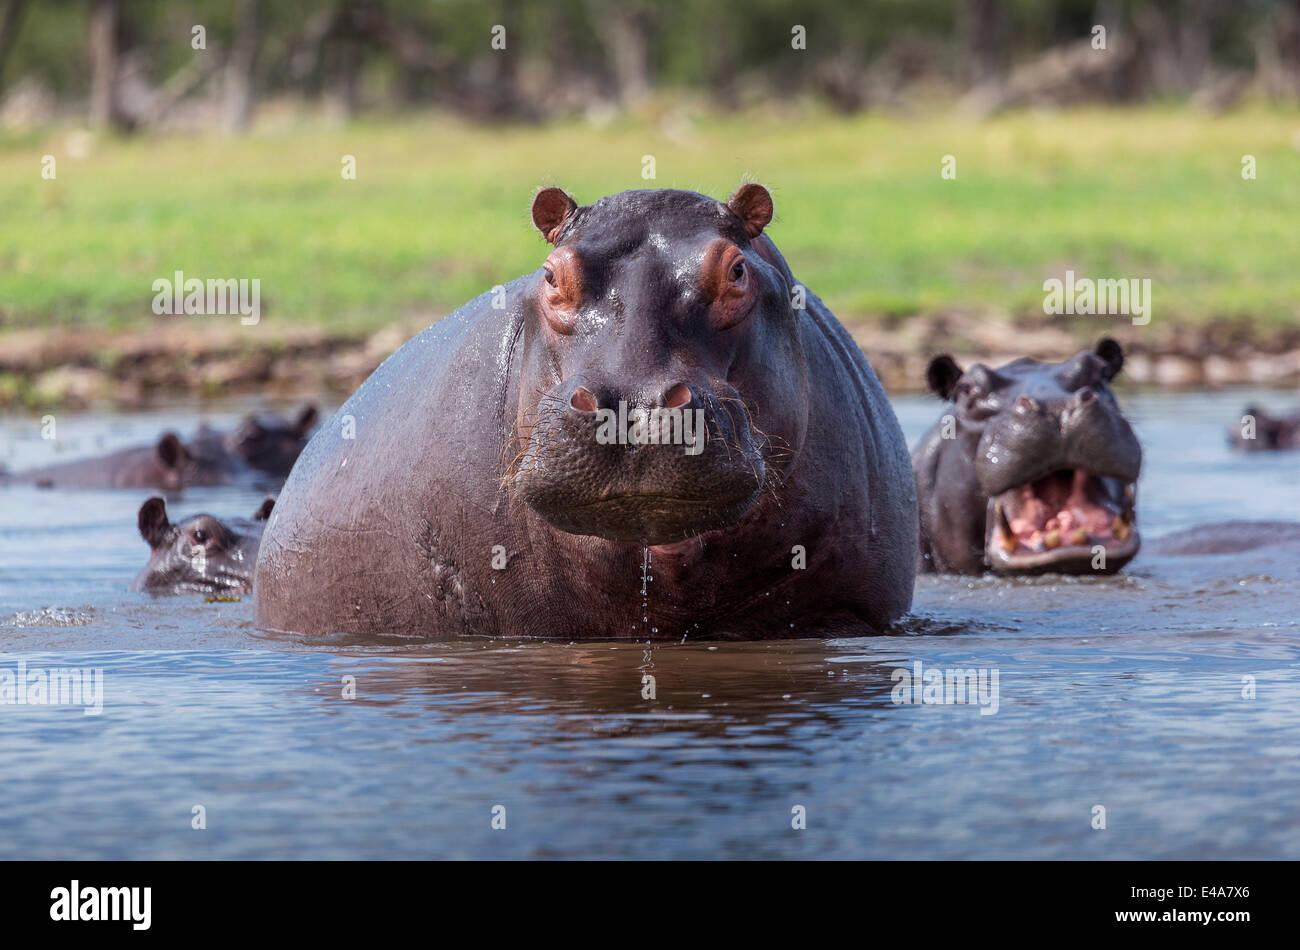 Hippopotamus, Okavango Delta, Botswana, Africa - Stock Image